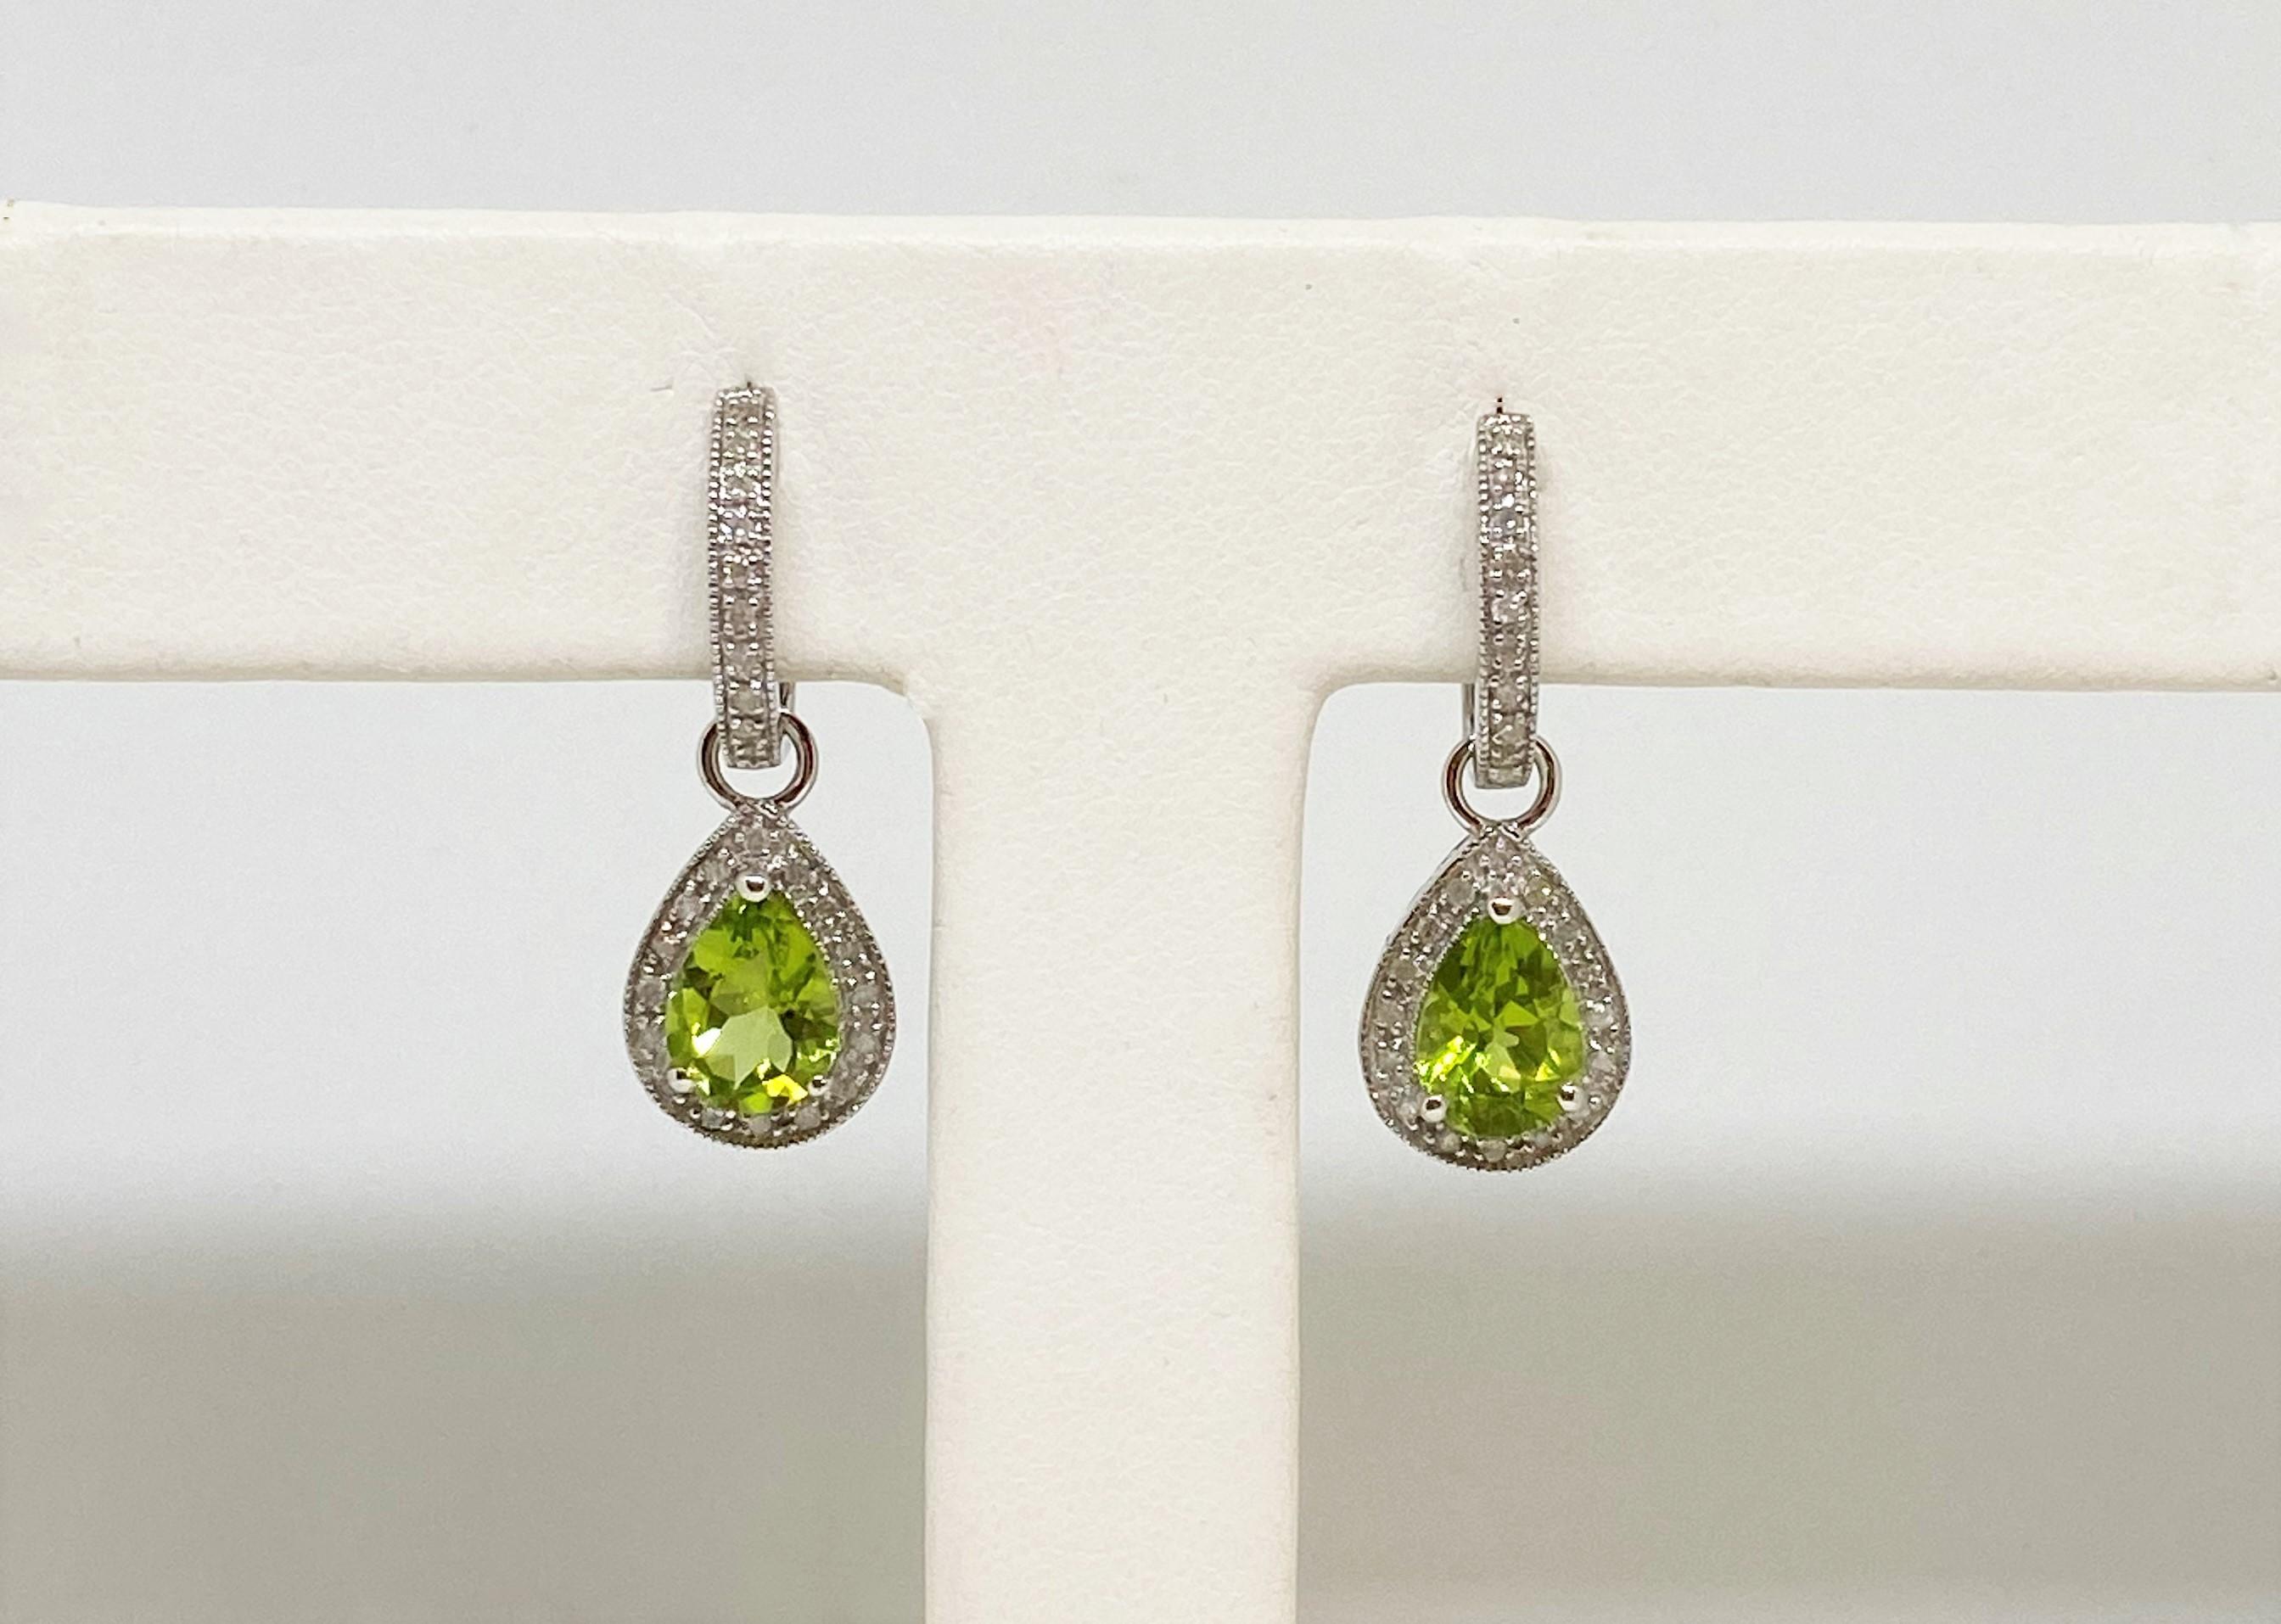 1.5 Carats Peridot White Gold Earrings